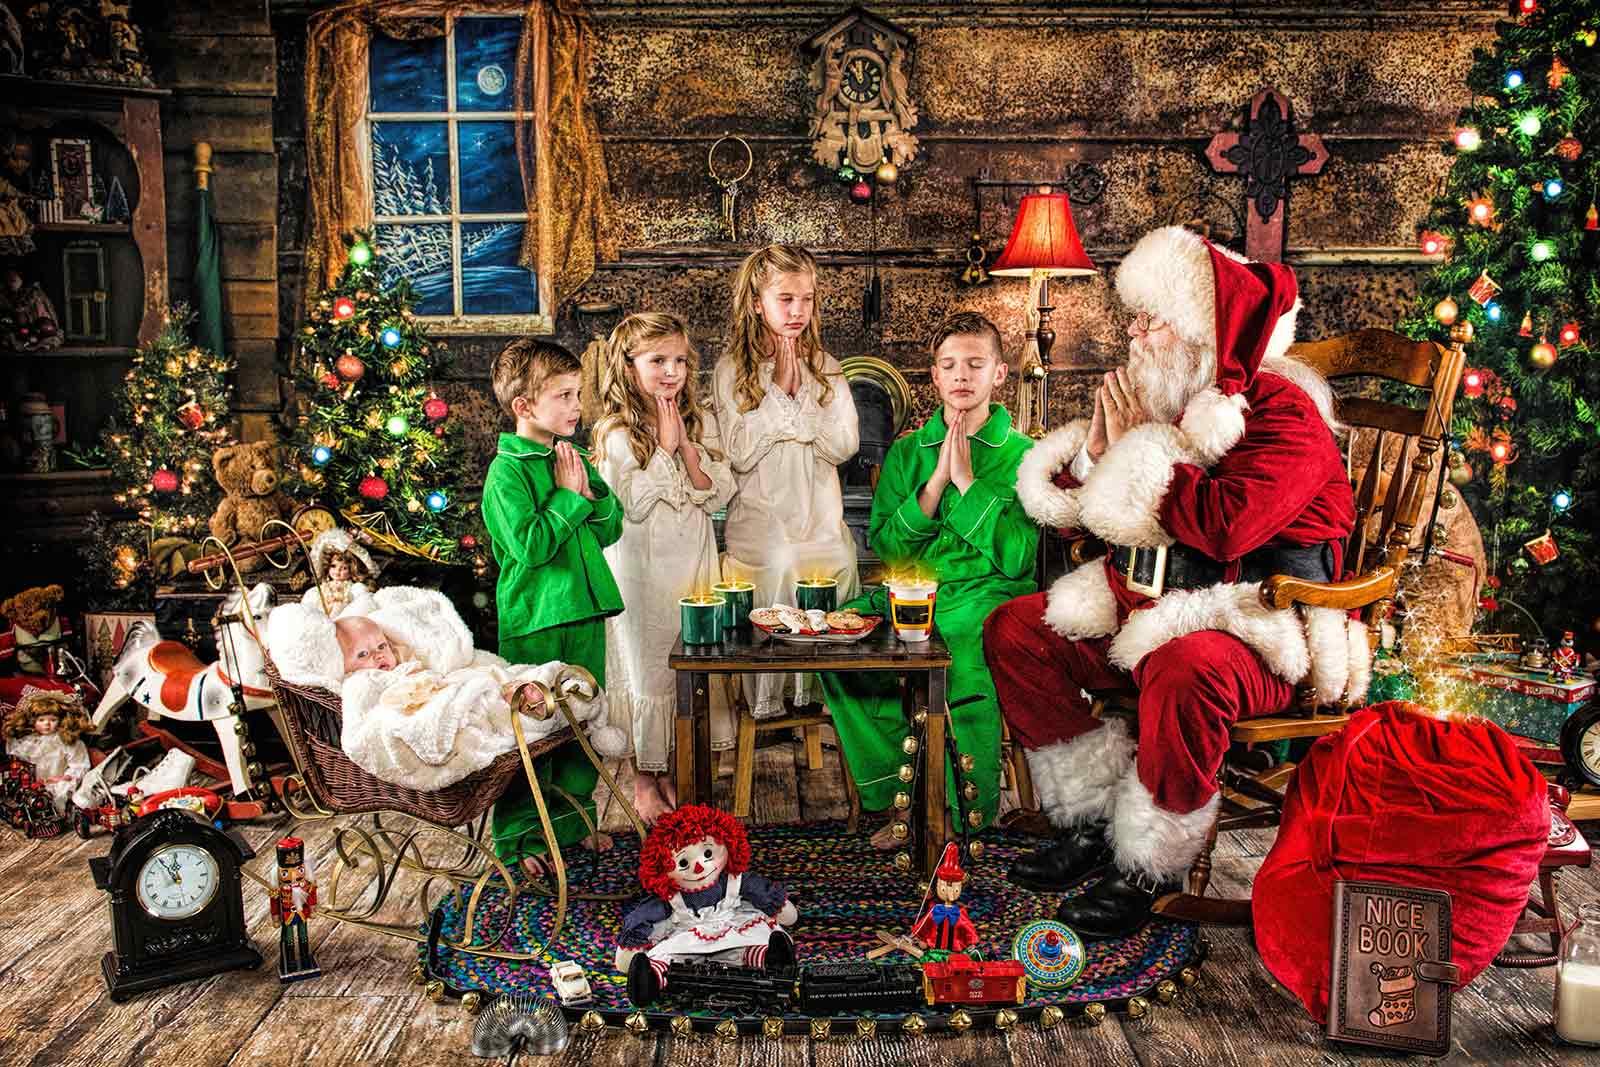 018_Magic-of-Santa-Anna-Thielen-Photography